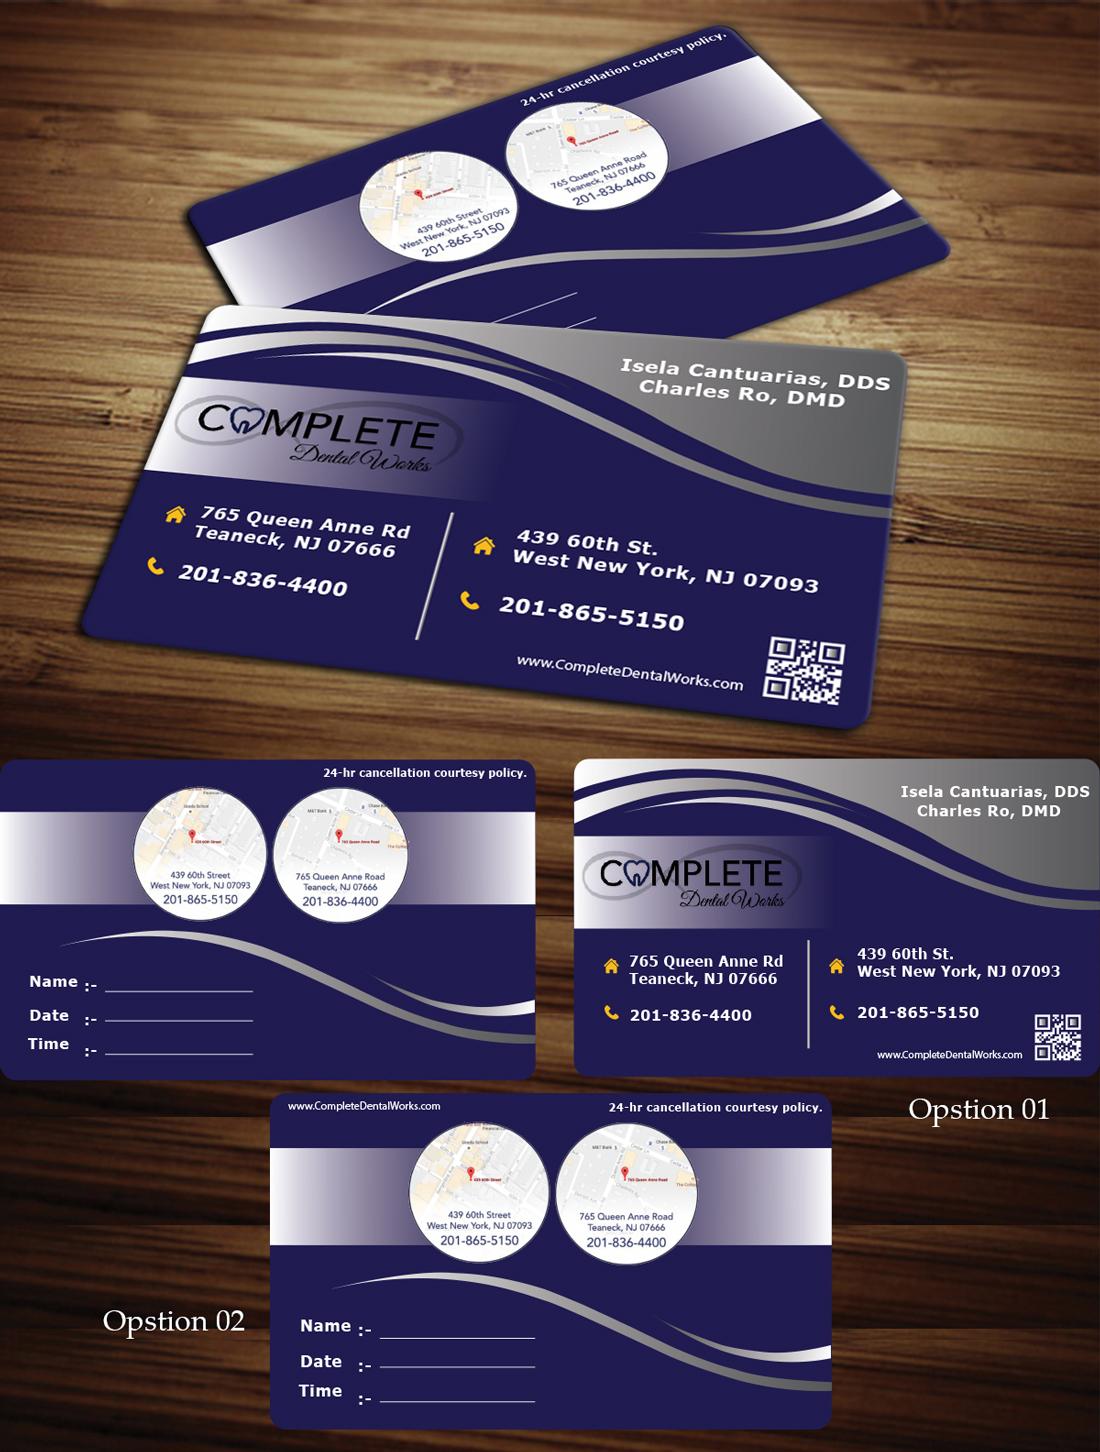 144 elegant business card designs dental business card design business card design by siriwardanasampath5 for one and only complete dental design 14448735 reheart Images